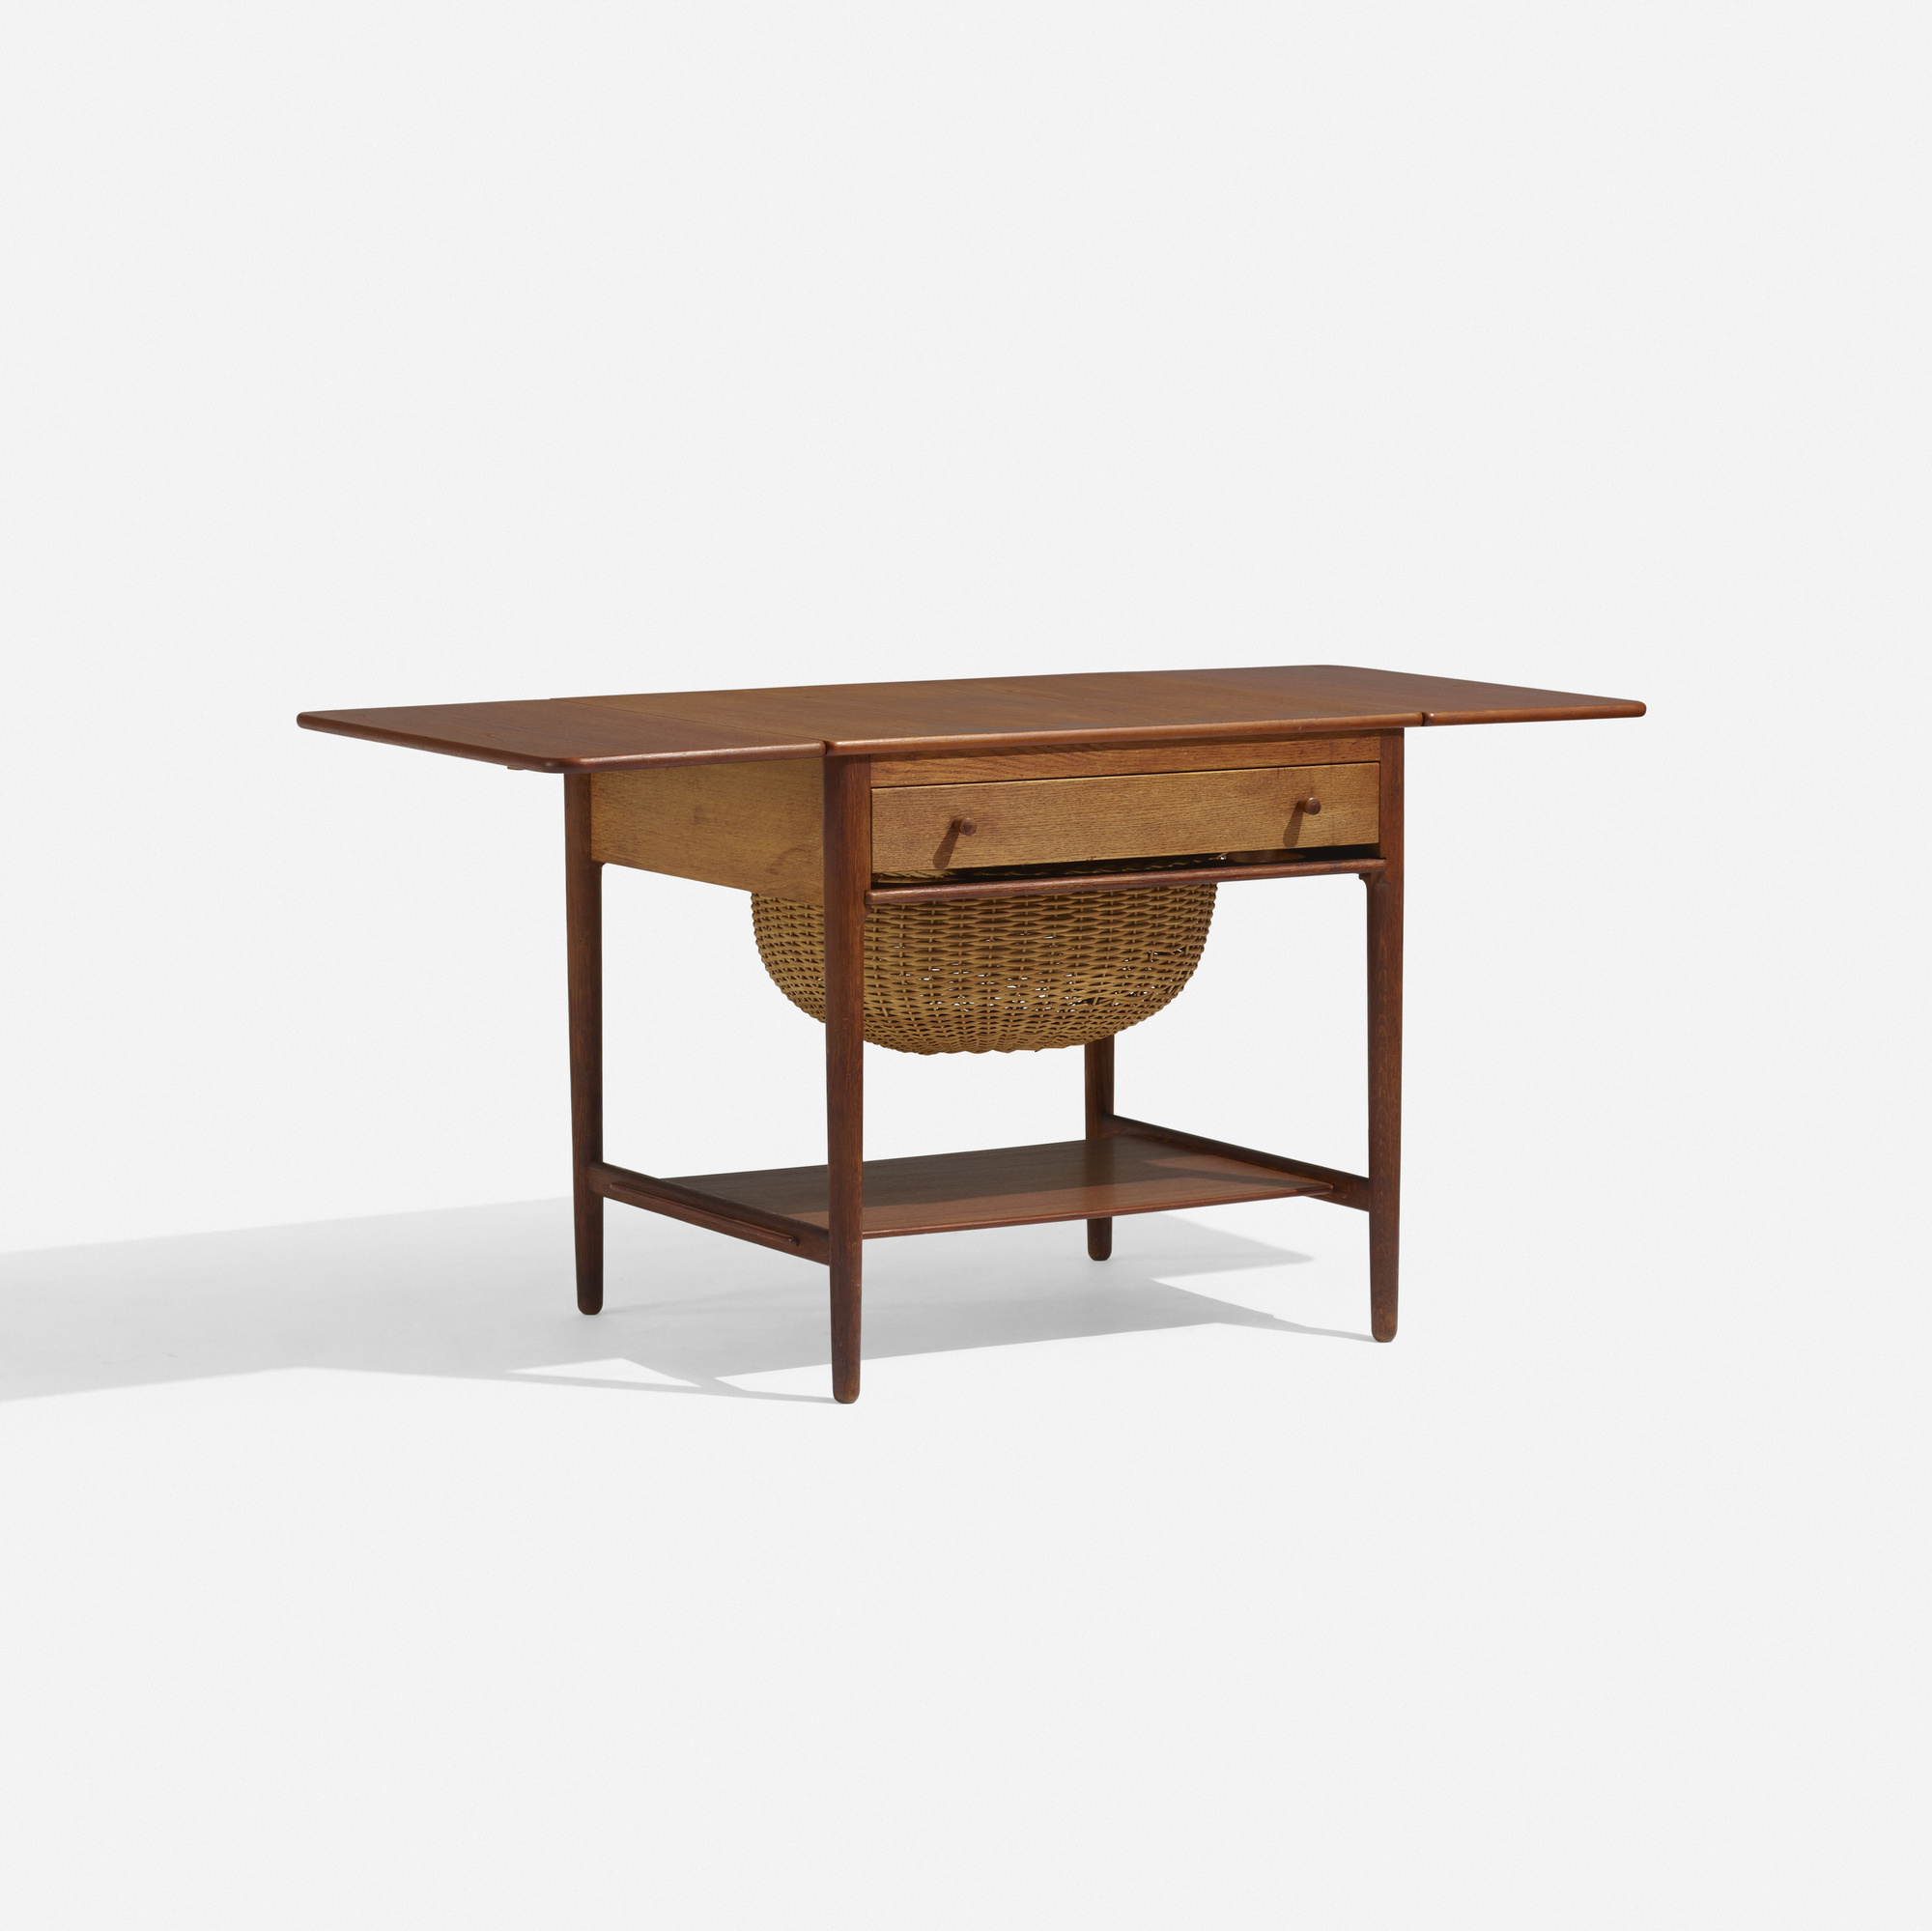 287: Hans J. Wegner / sewing table, model AT 33 (2 of 3)